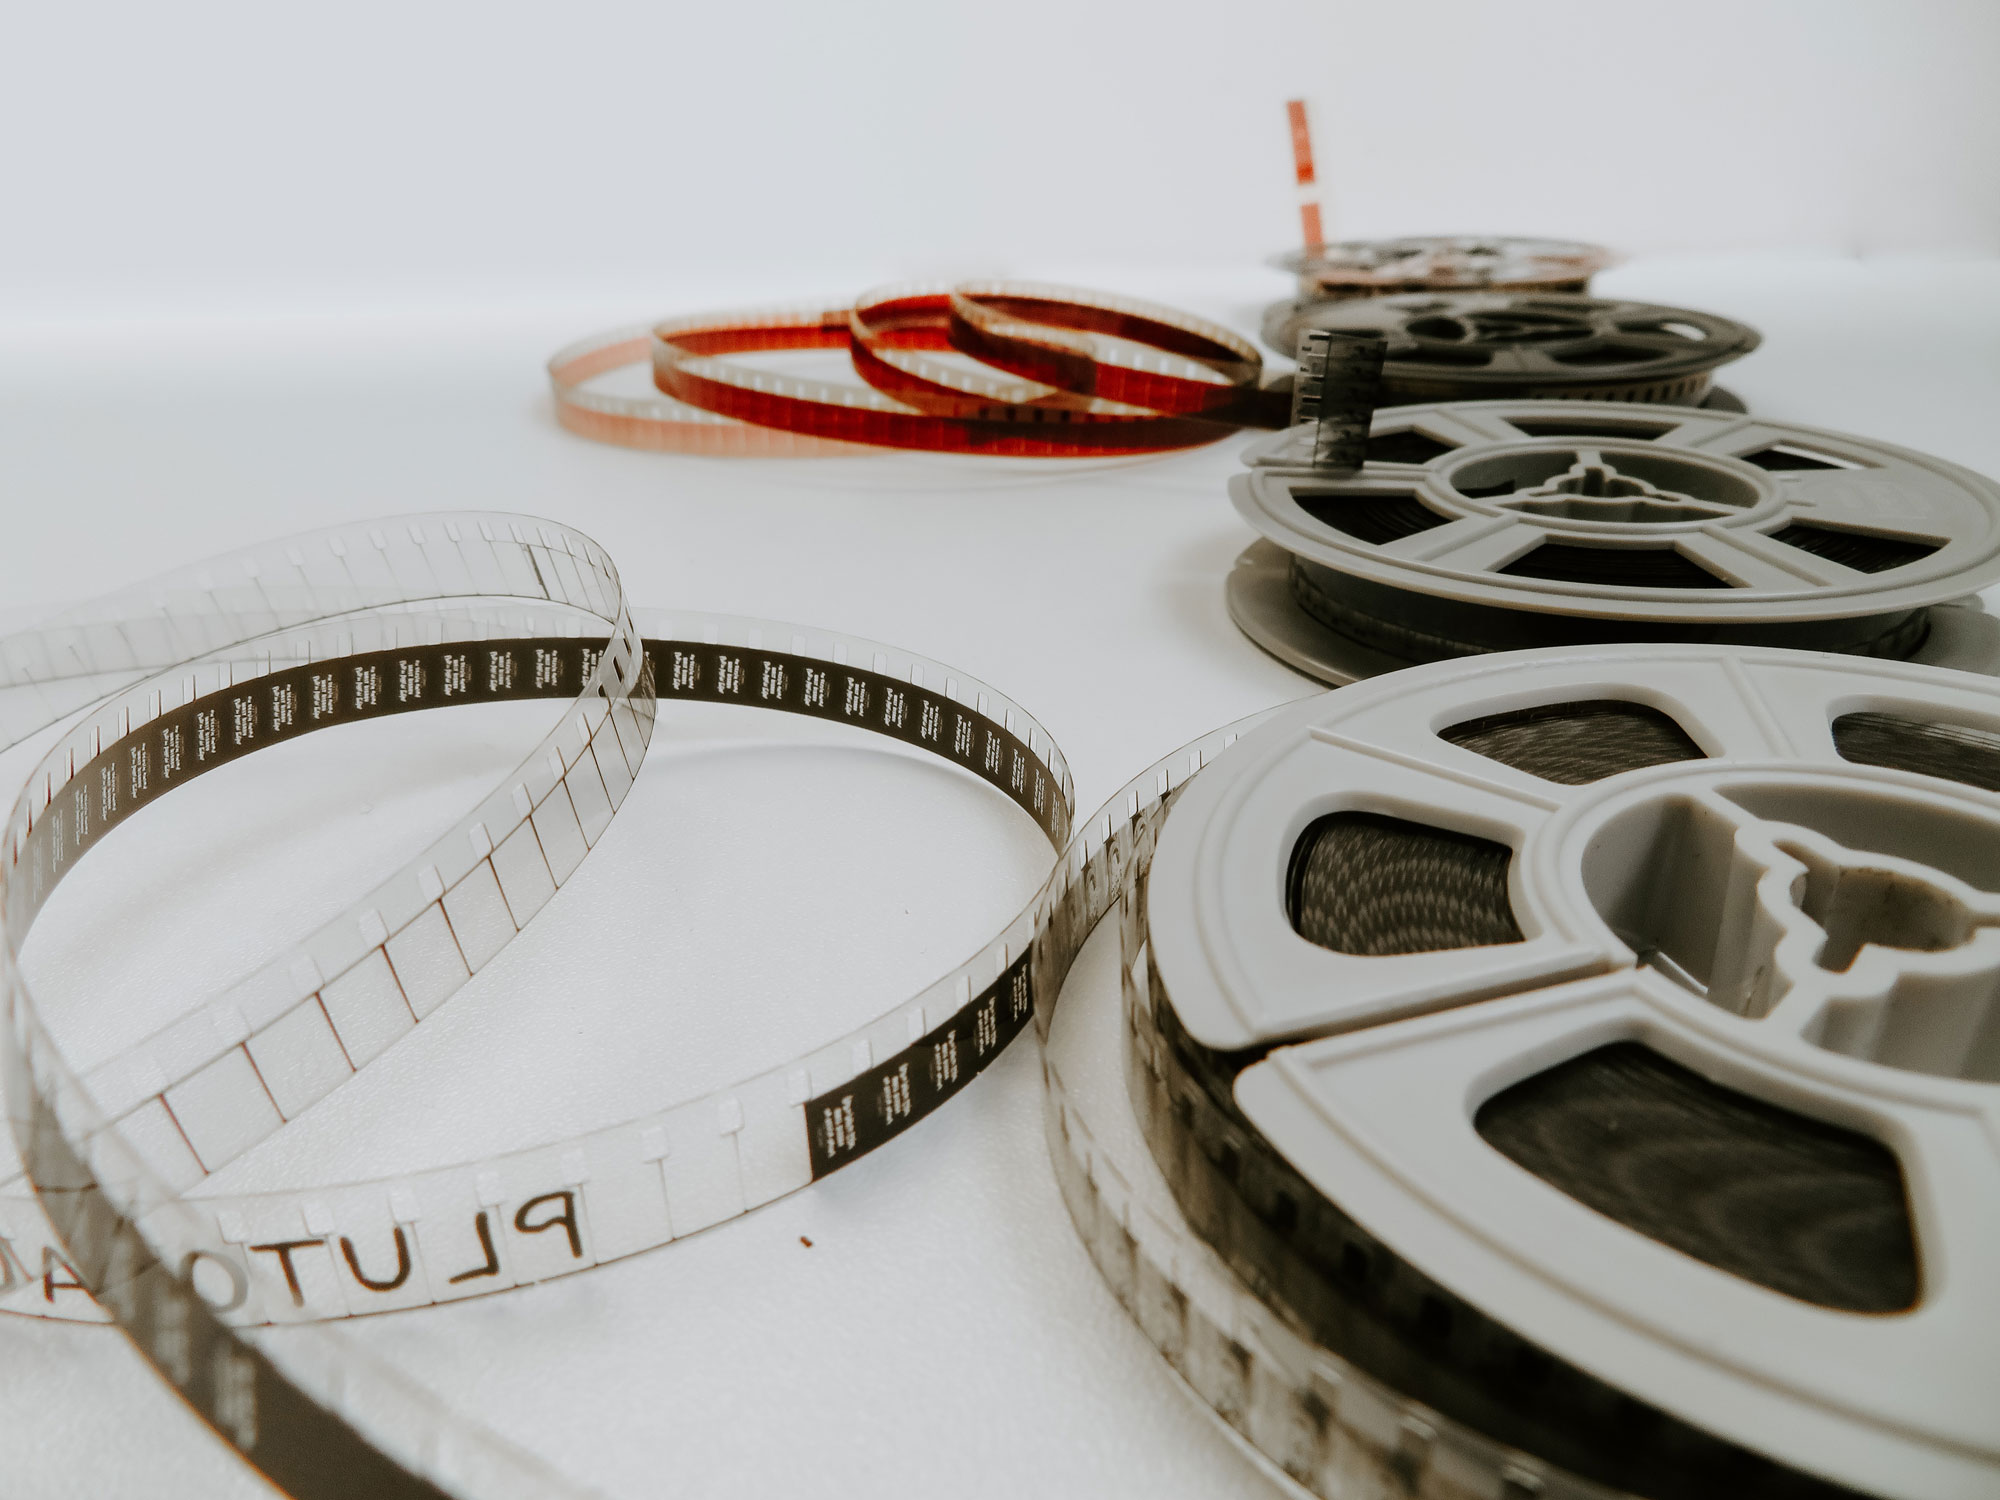 Super 8 Filmkassetten, Super 8 Film-Kamera/ Filmformat, Filmkamera